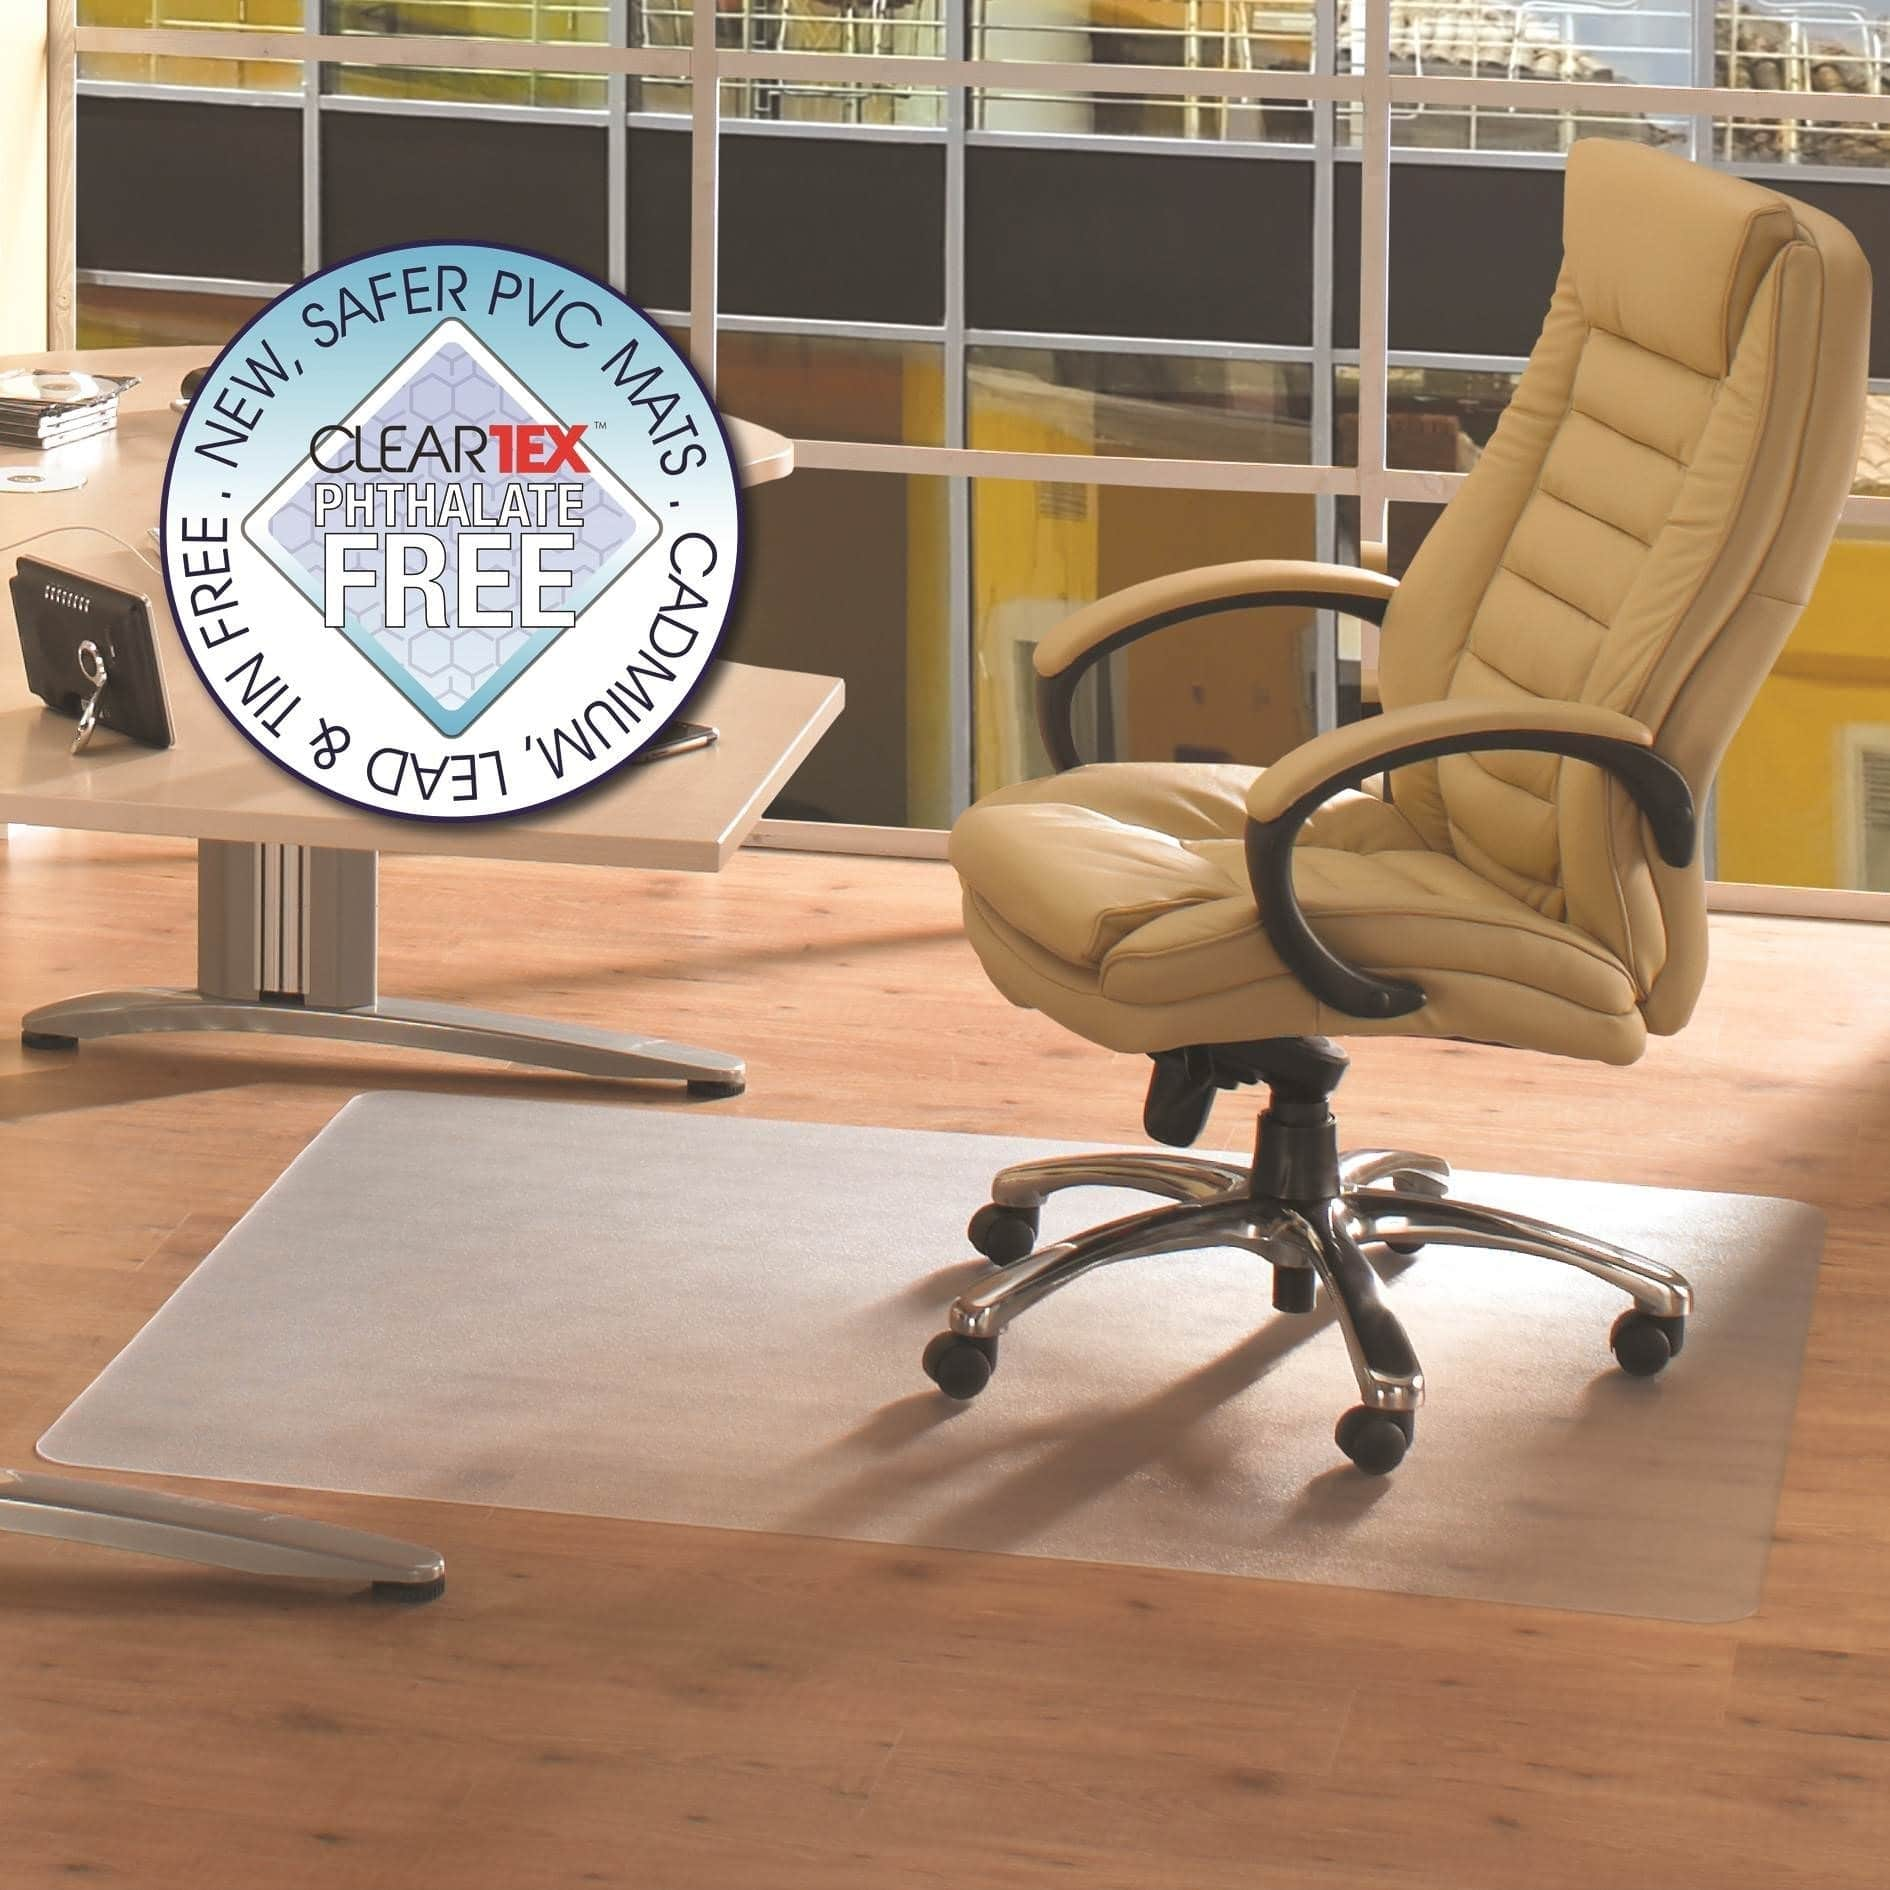 Office Chair Mat 45 X 60 Modern White Chairs Phthalate Free Pvc Rectangular For Hard Floor Size 48 Floortex Chairmat 48x60 Clear